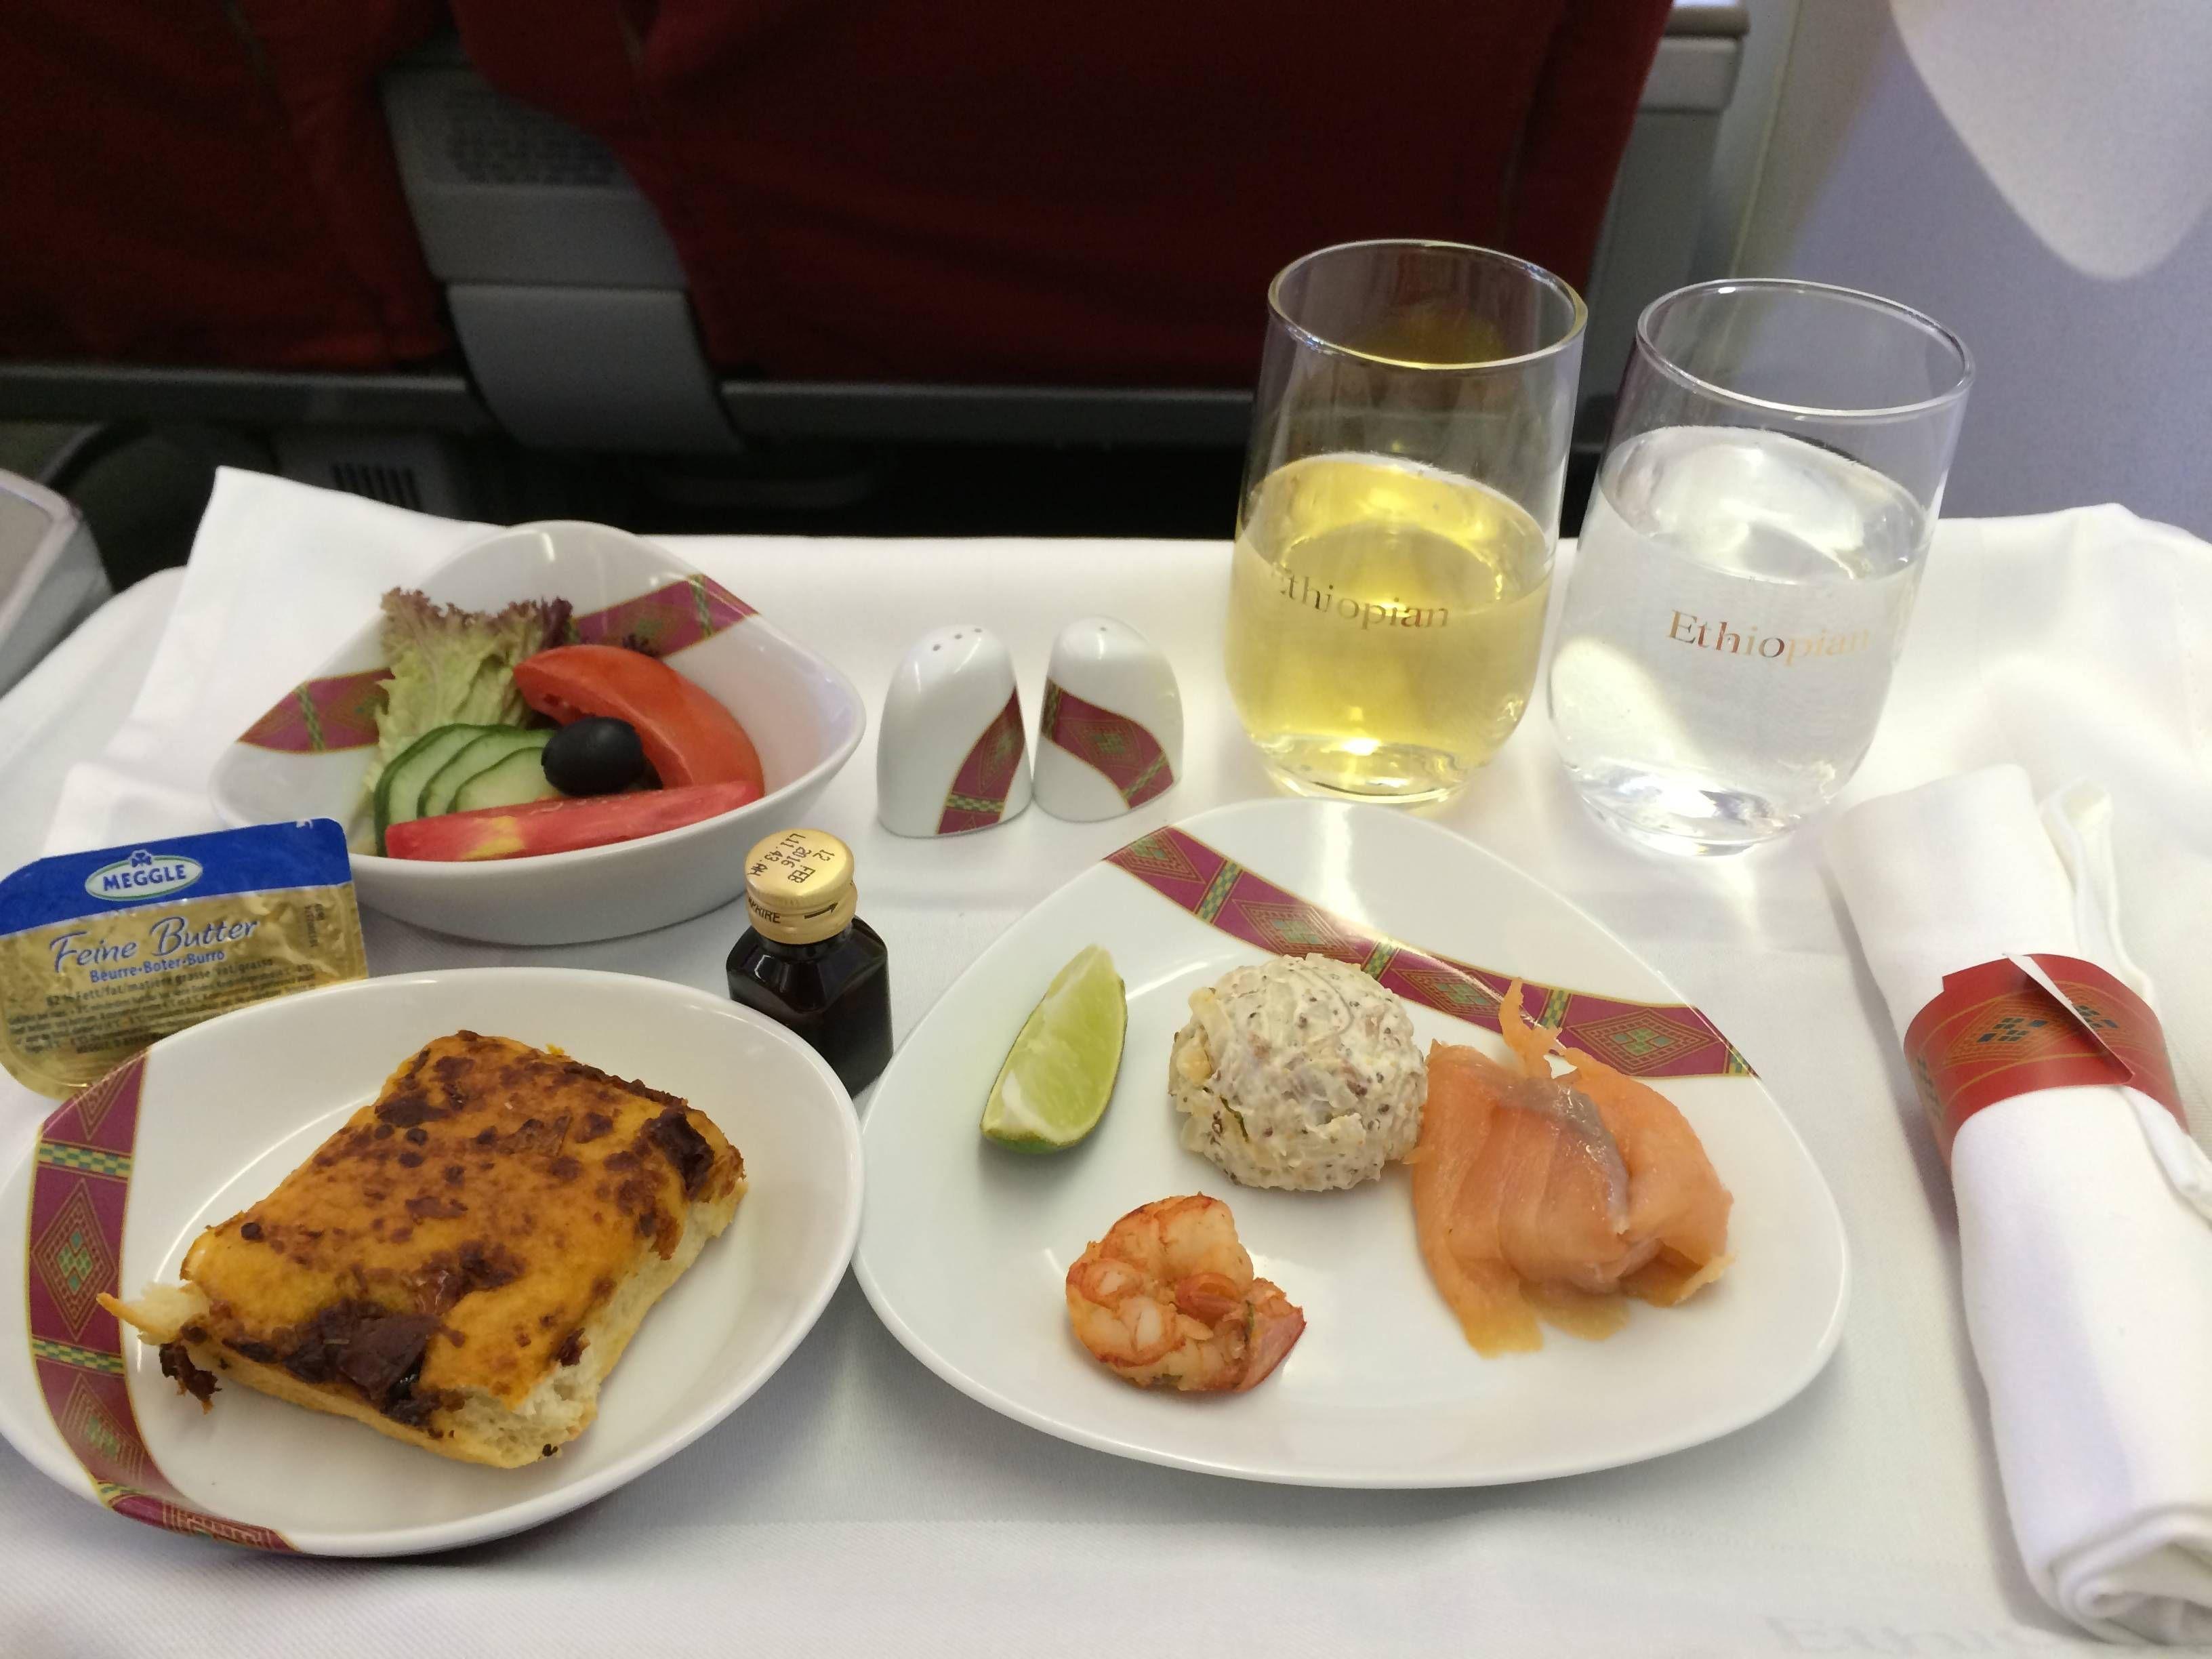 Ethiopian Airlines Business Class Executiva B767 - passageirodeprimeira